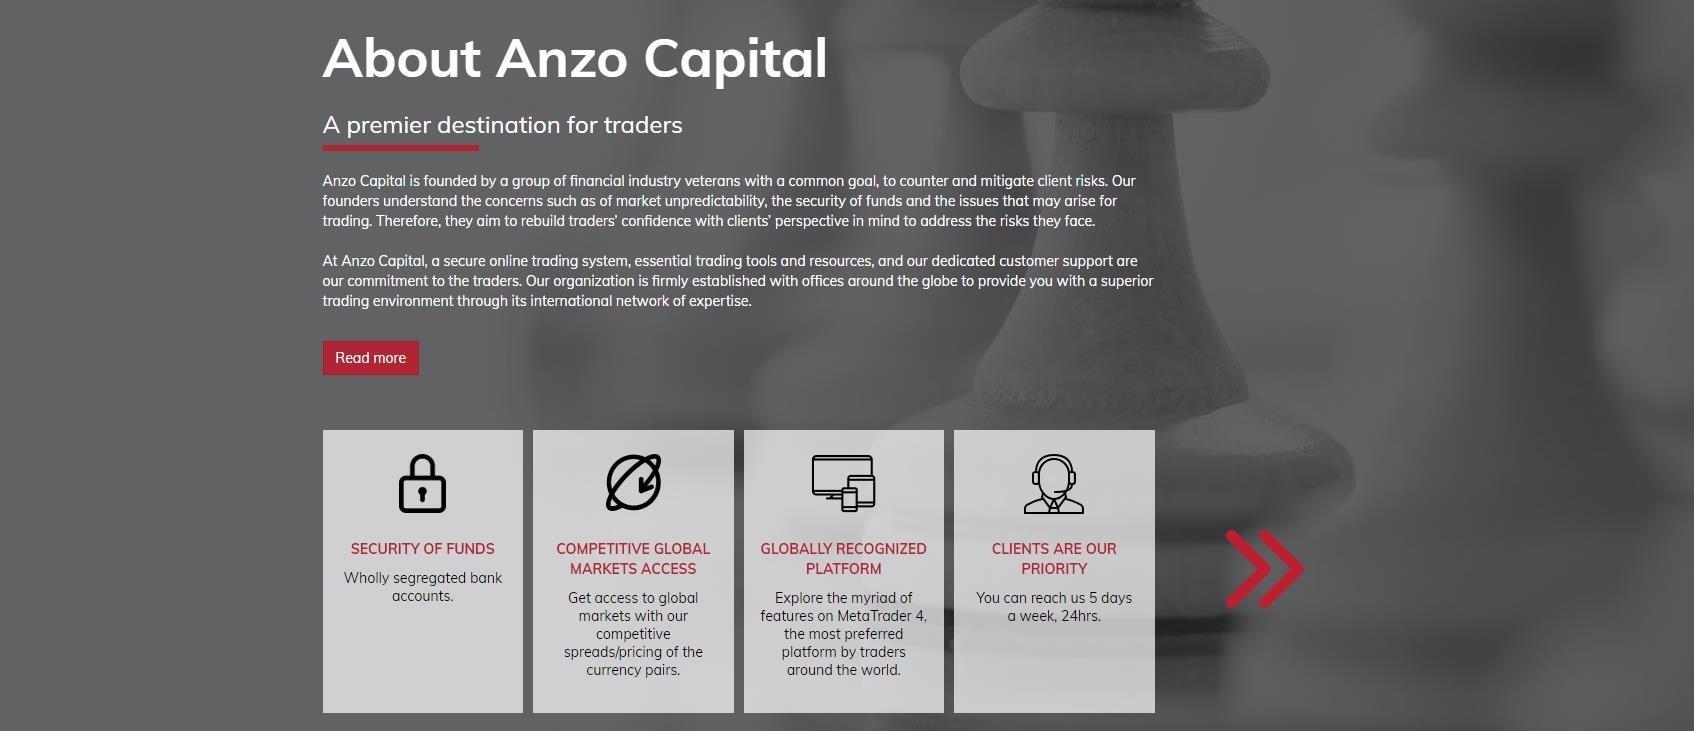 торговые условия anzo capital